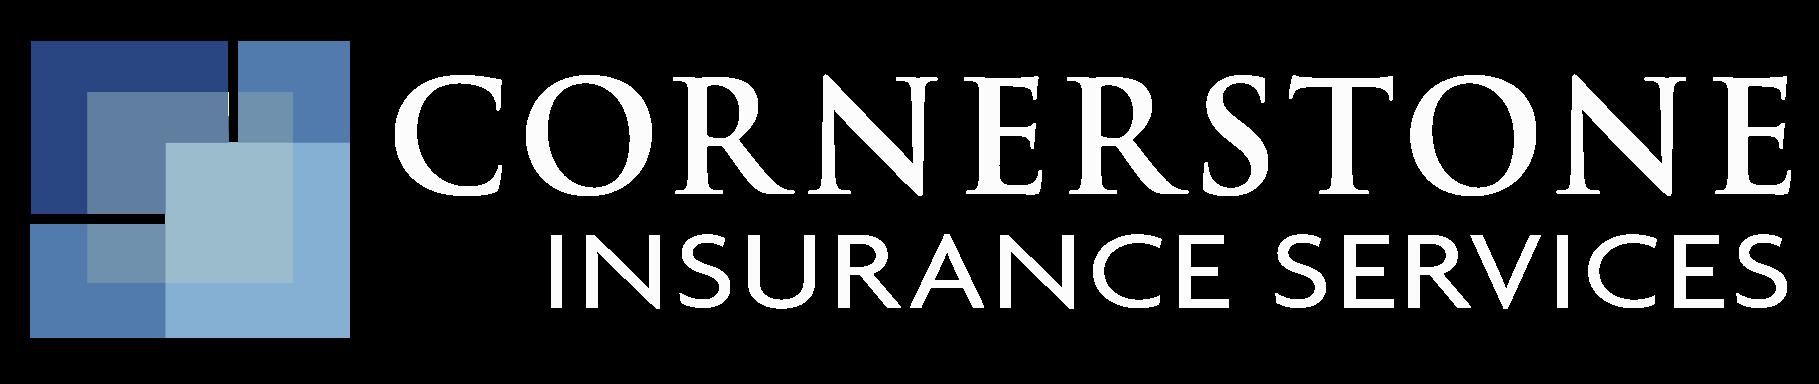 Cornerstone Insurance Services